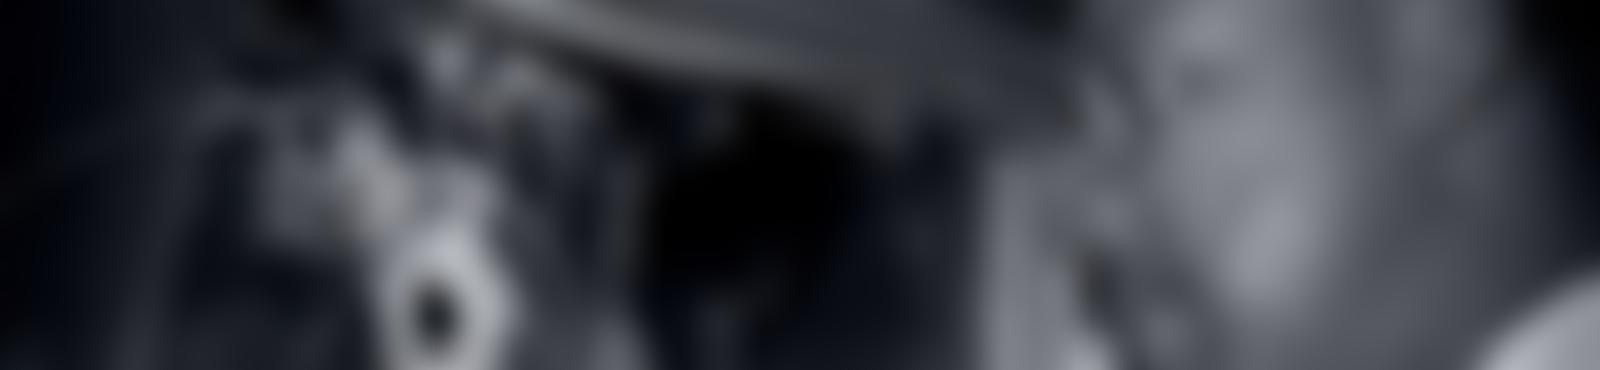 Blurred dfacc5ae 0cbc 4f4d 949a dc9c7f76bc1e